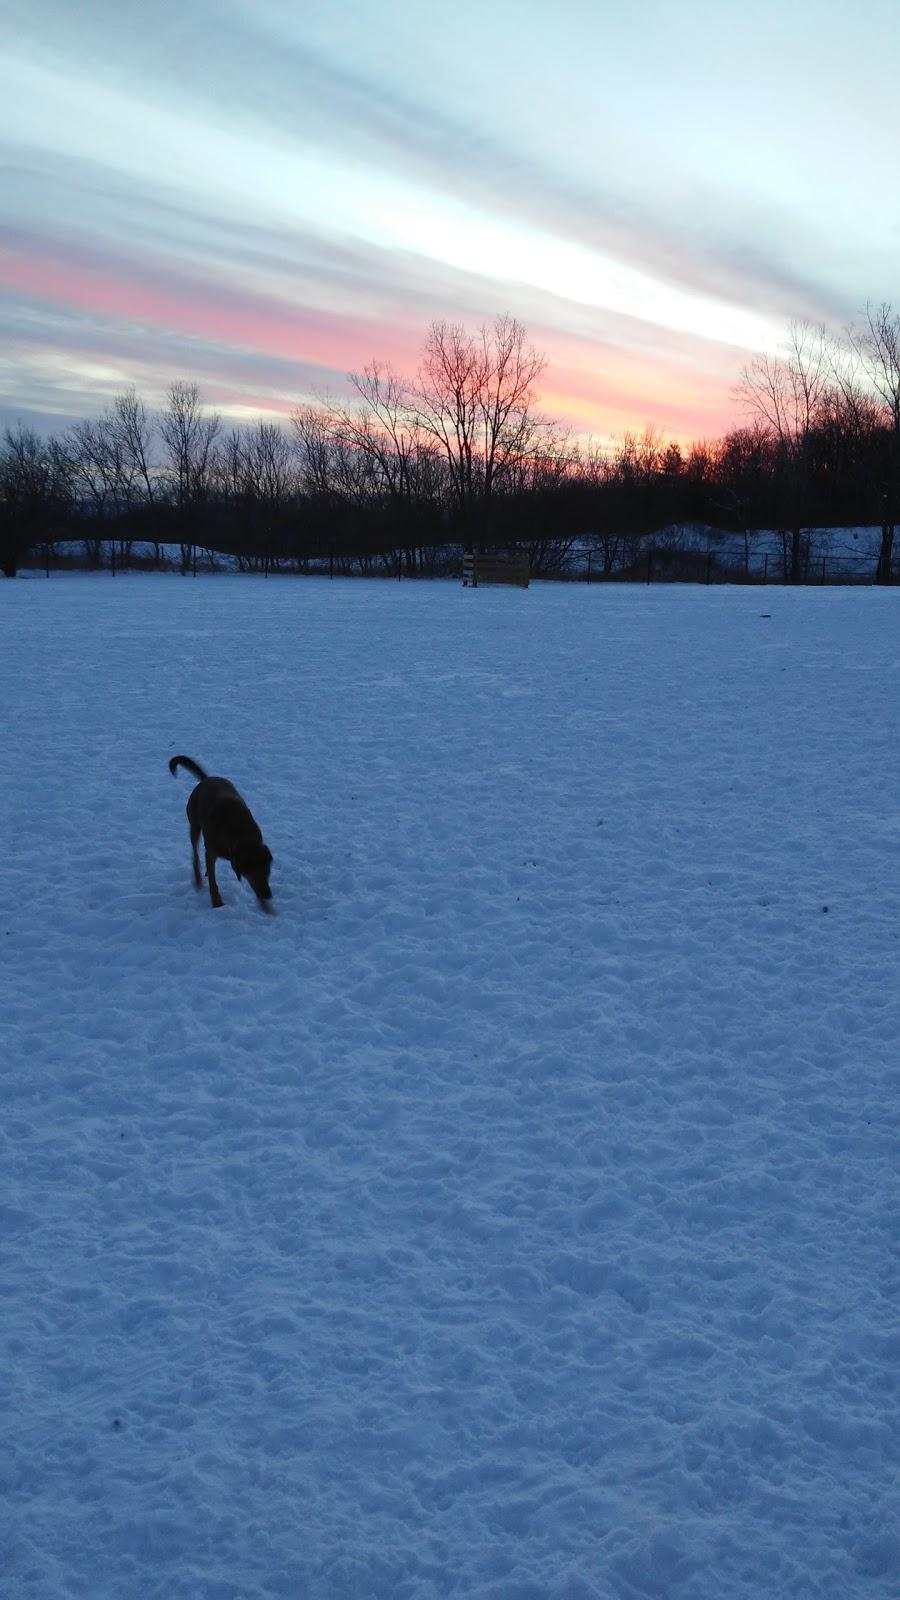 King Road Leash Free Dog Park | park | 1800 King Rd, Burlington, ON L7P 5A5, Canada